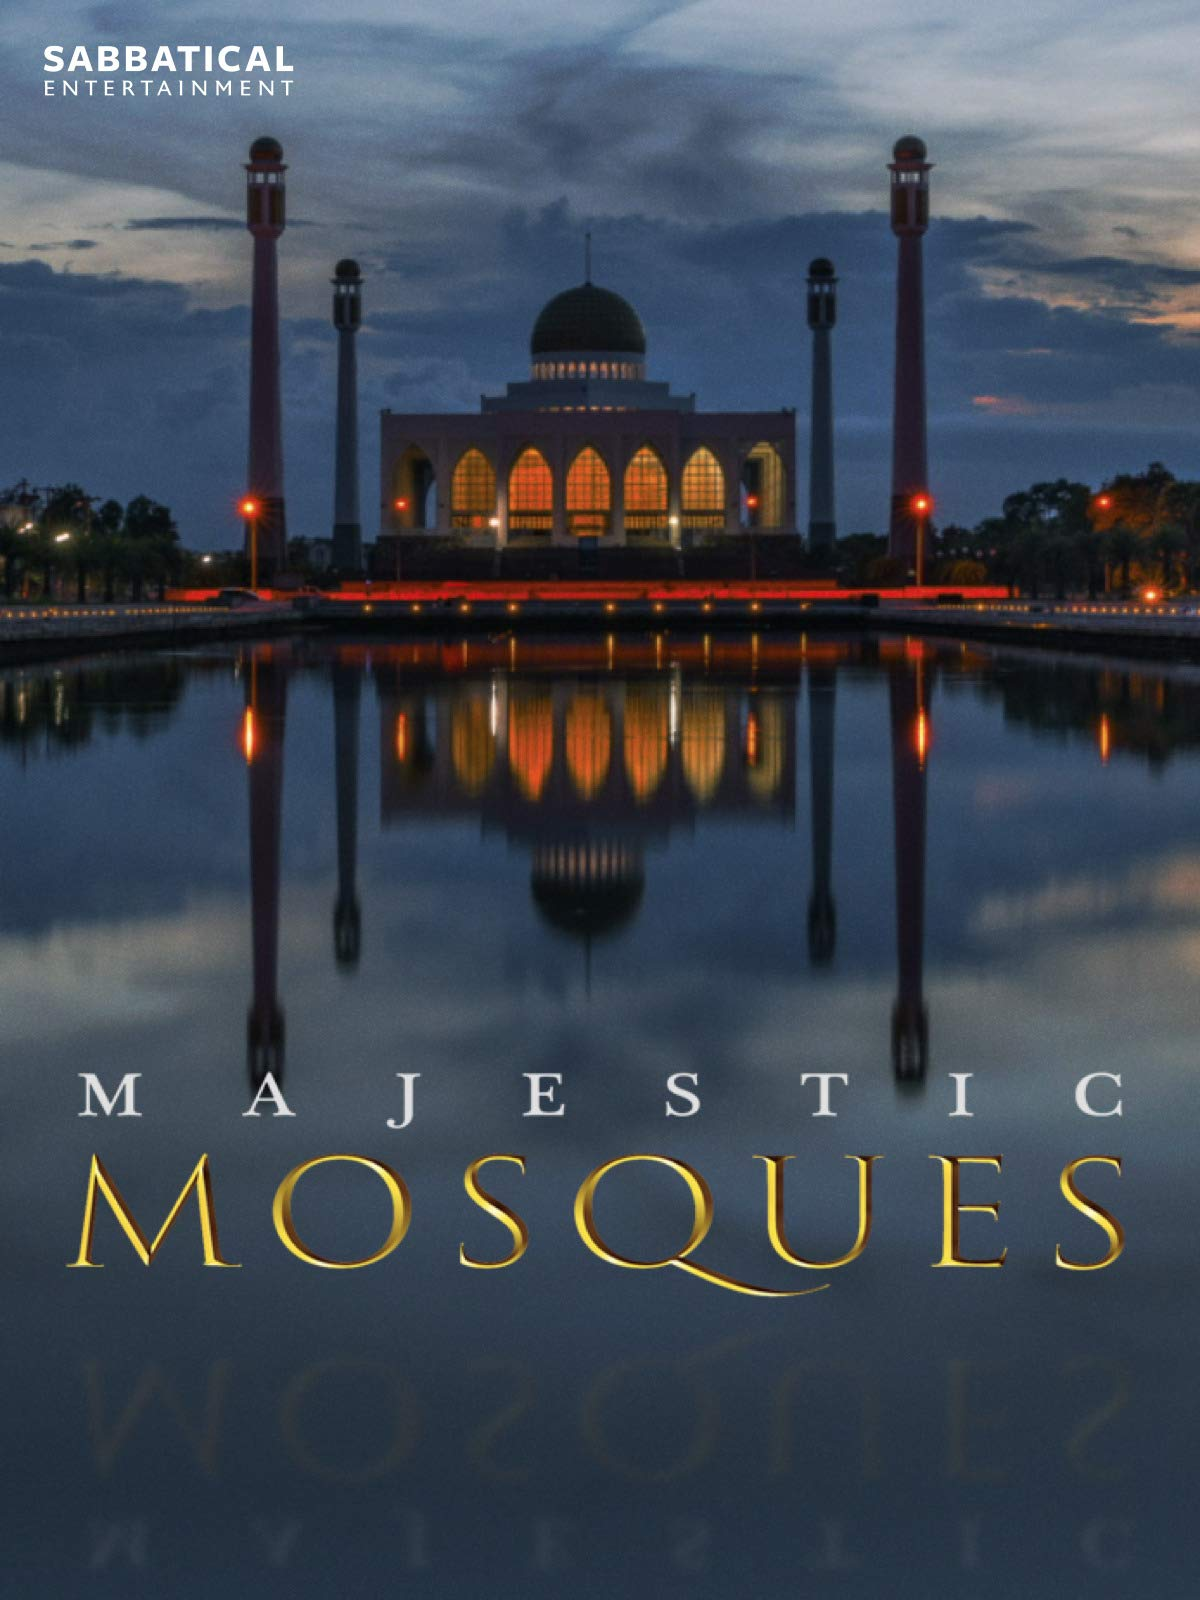 Majestic Mosques on Amazon Prime Video UK